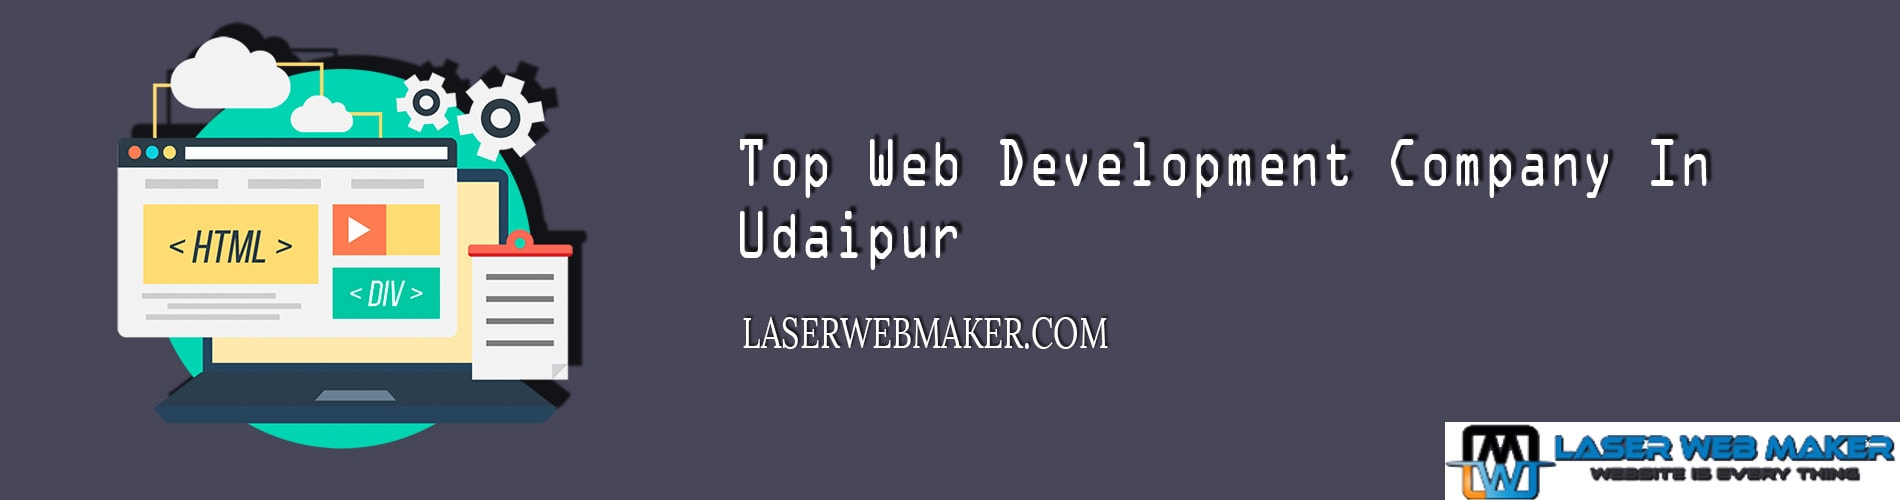 Top Web Development Company In Udaipur